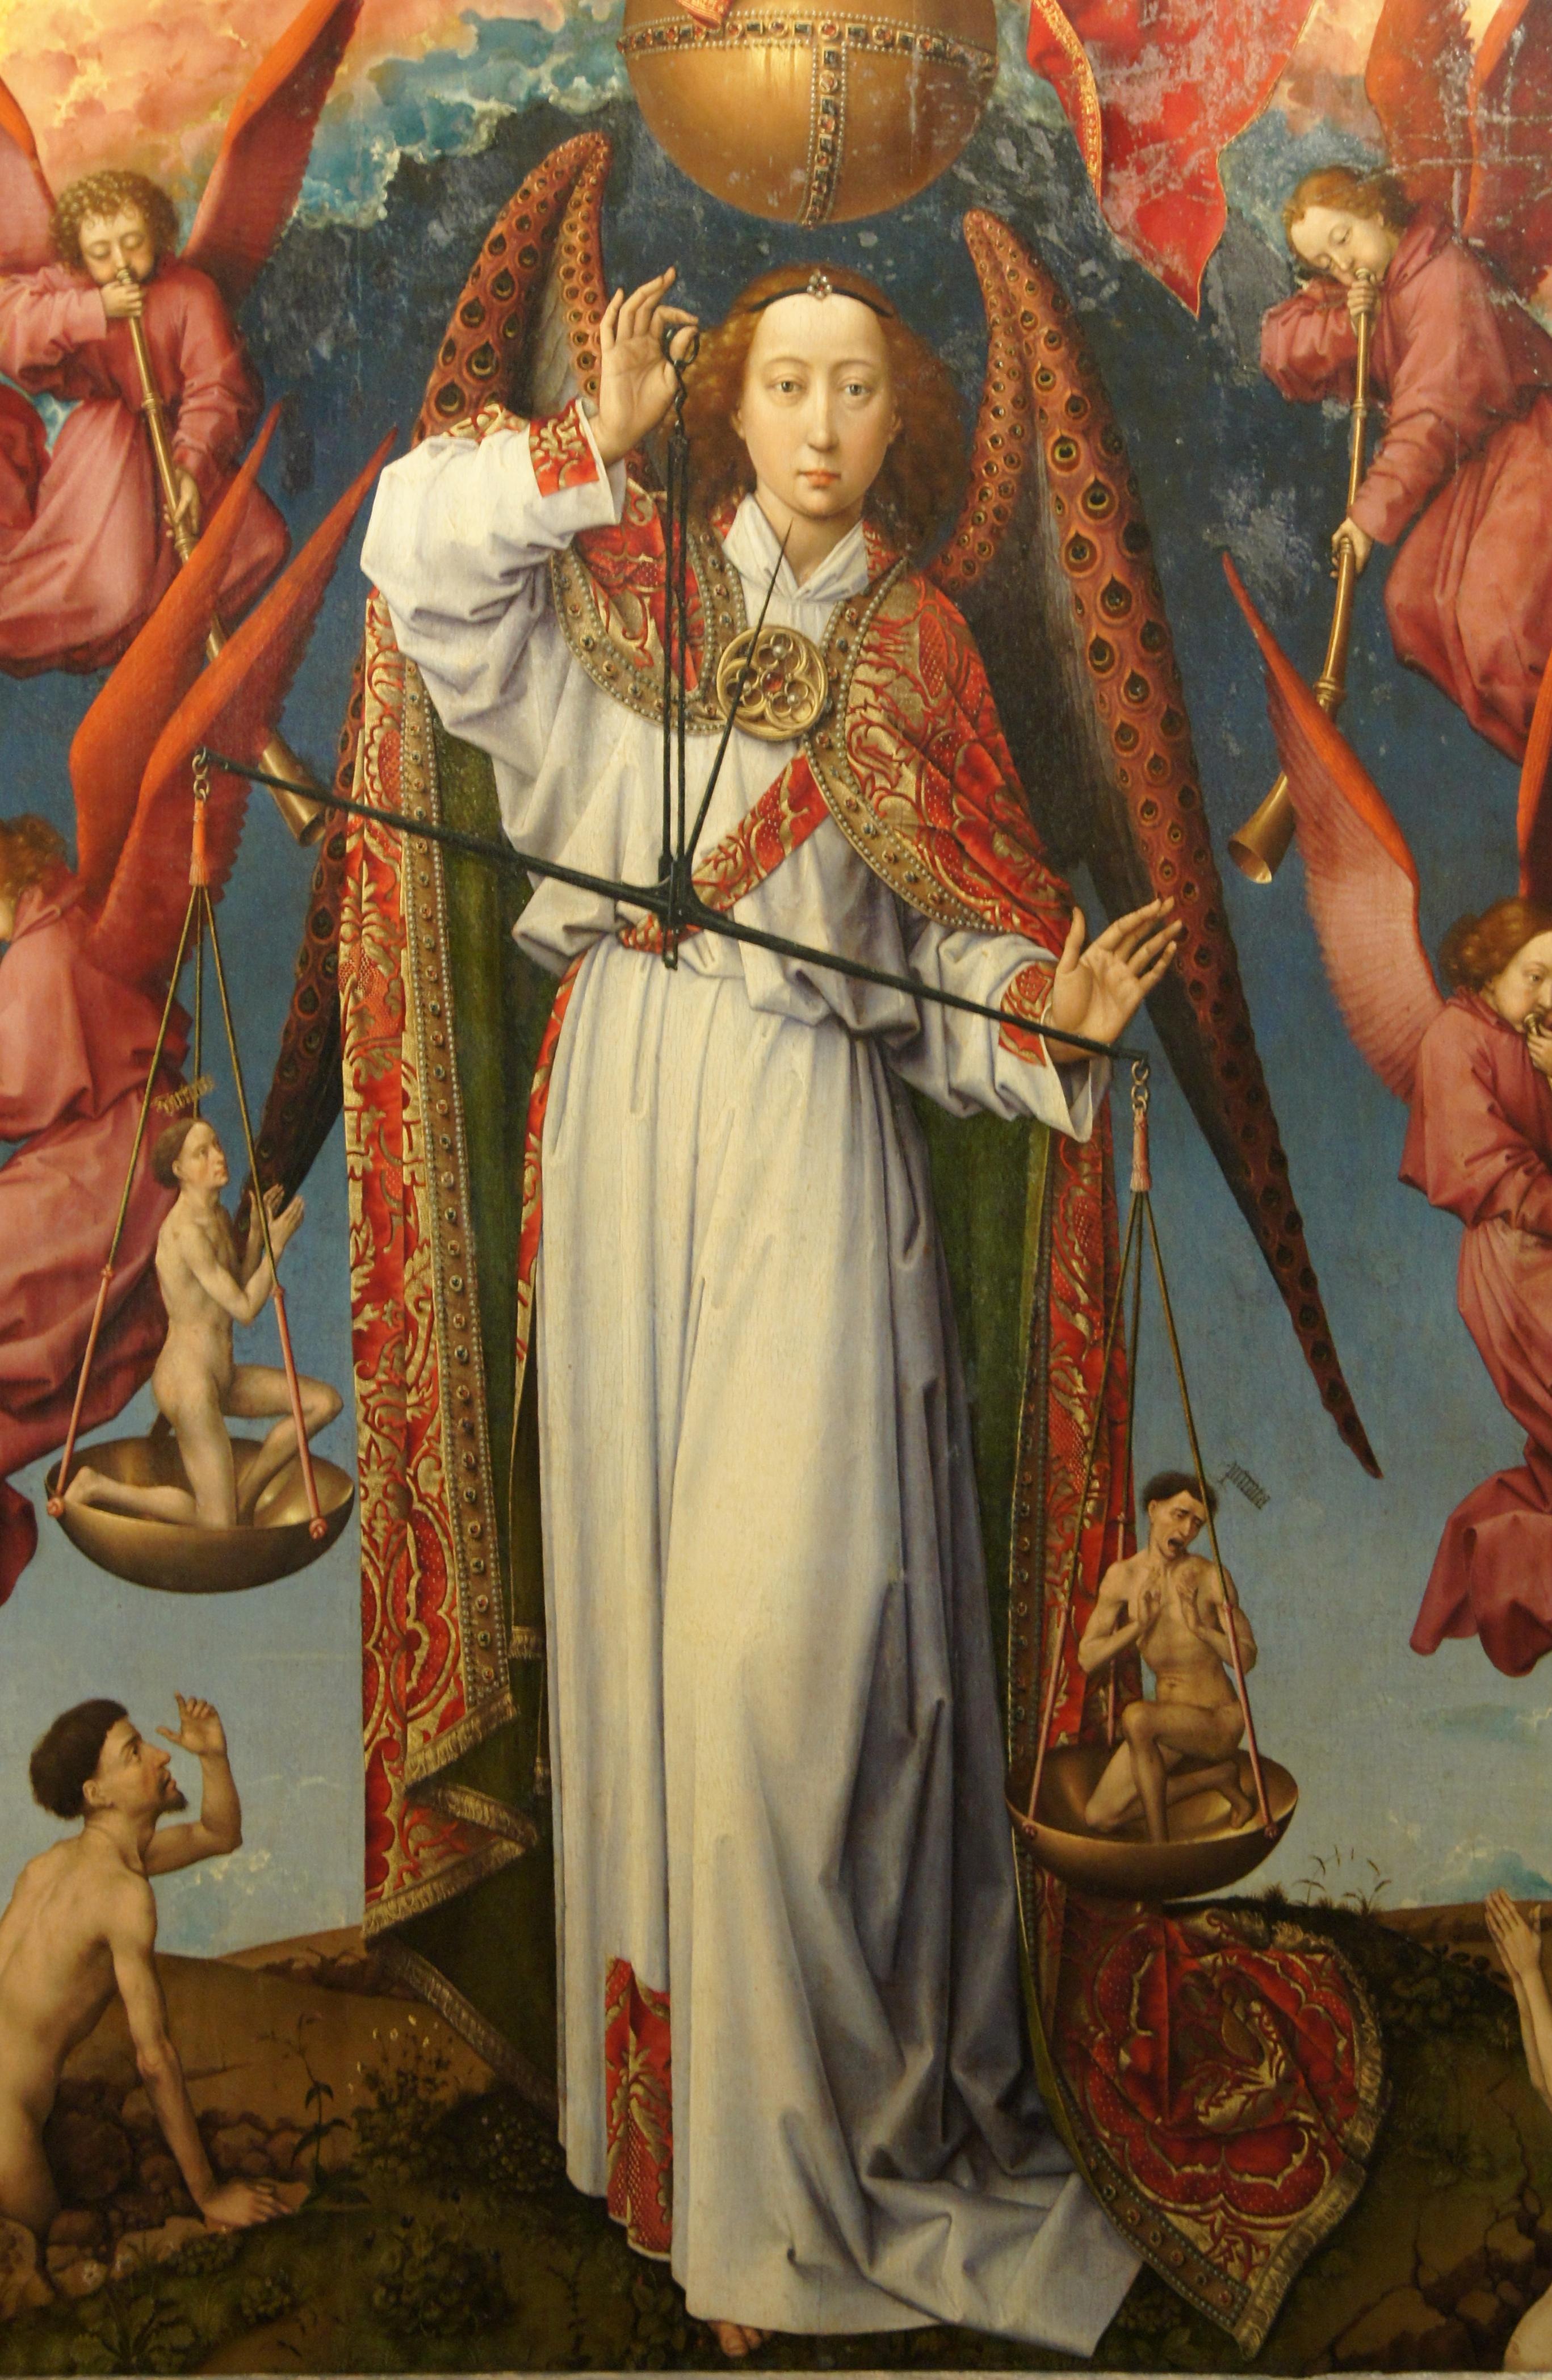 https://upload.wikimedia.org/wikipedia/commons/1/17/Polyptyque_du_jugement_dernier_roger_van_der_Weyden_Beaune.jpg